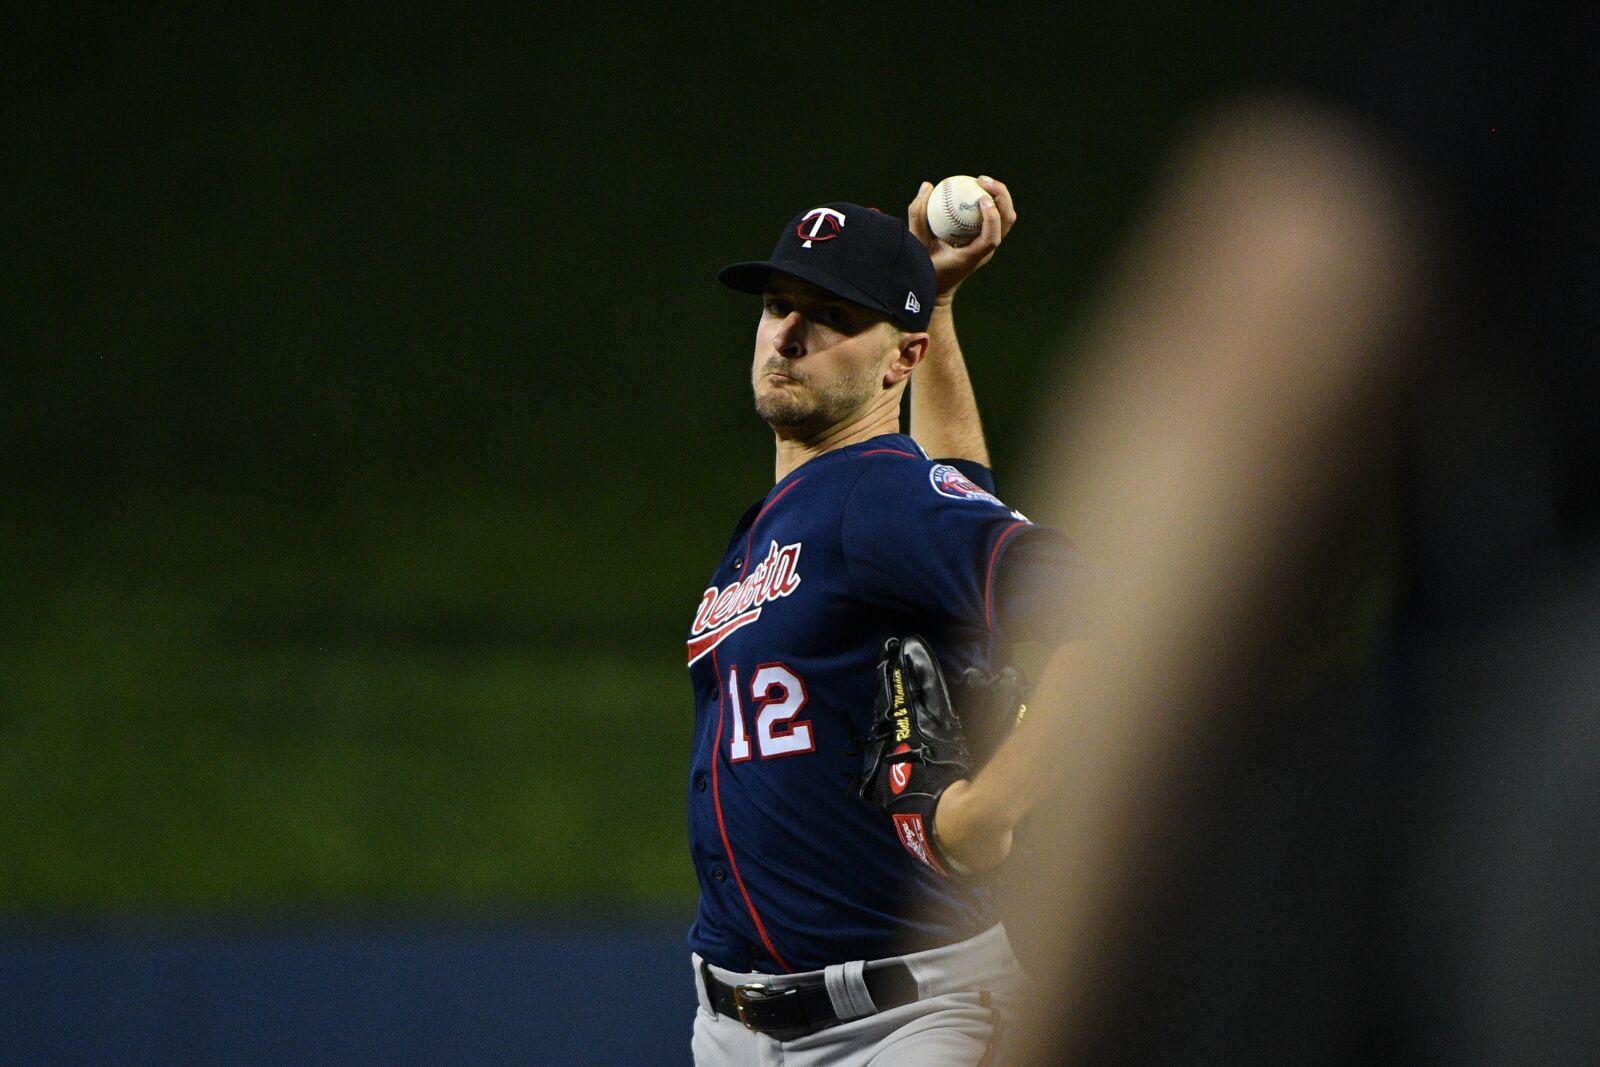 Minnesota Twins: Does Jake Odorizzi warrant a qualifying offer?